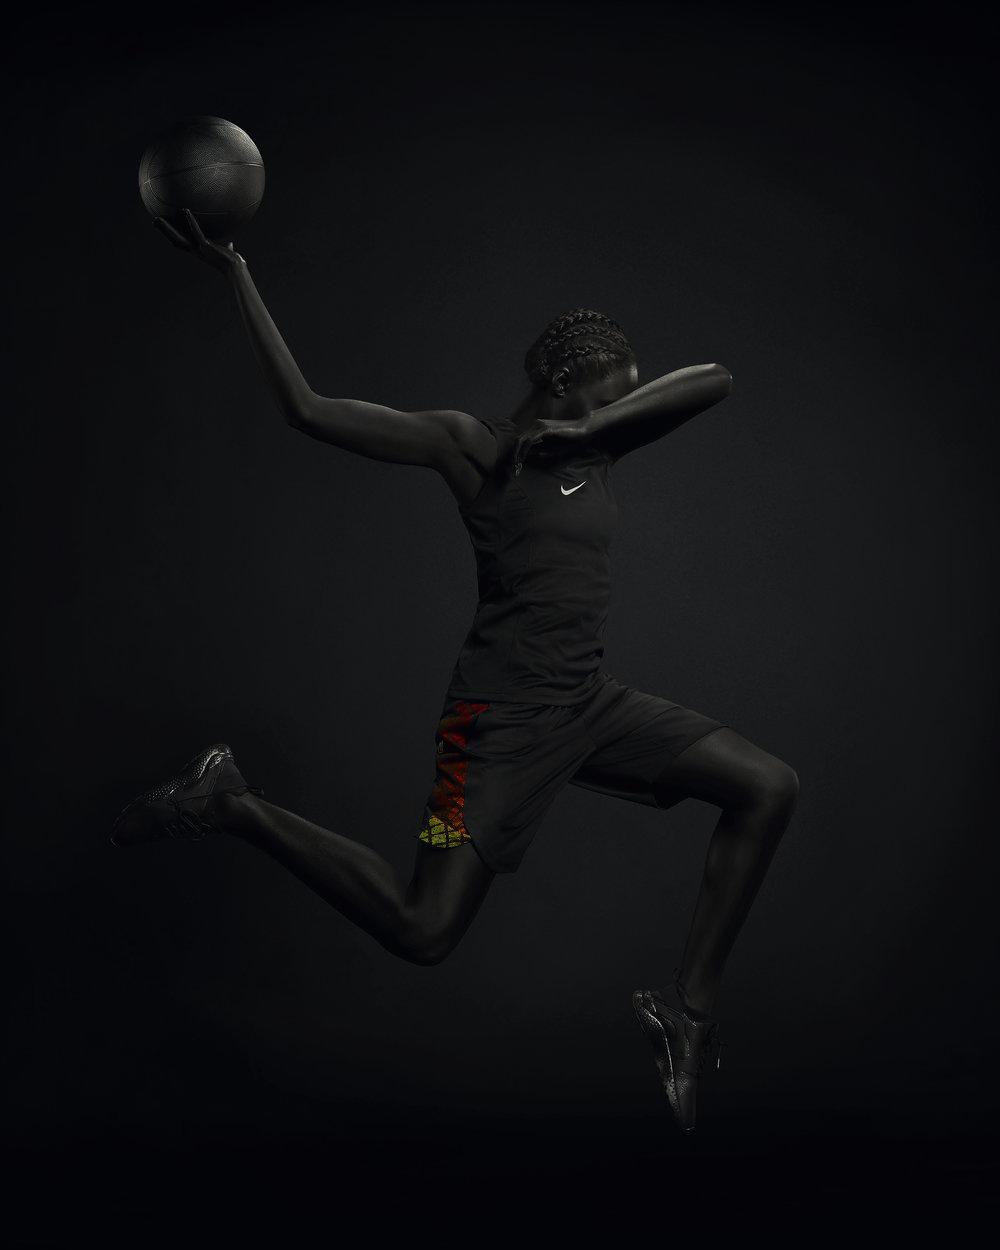 Bball_7_athletic_sample_059 copy.jpg